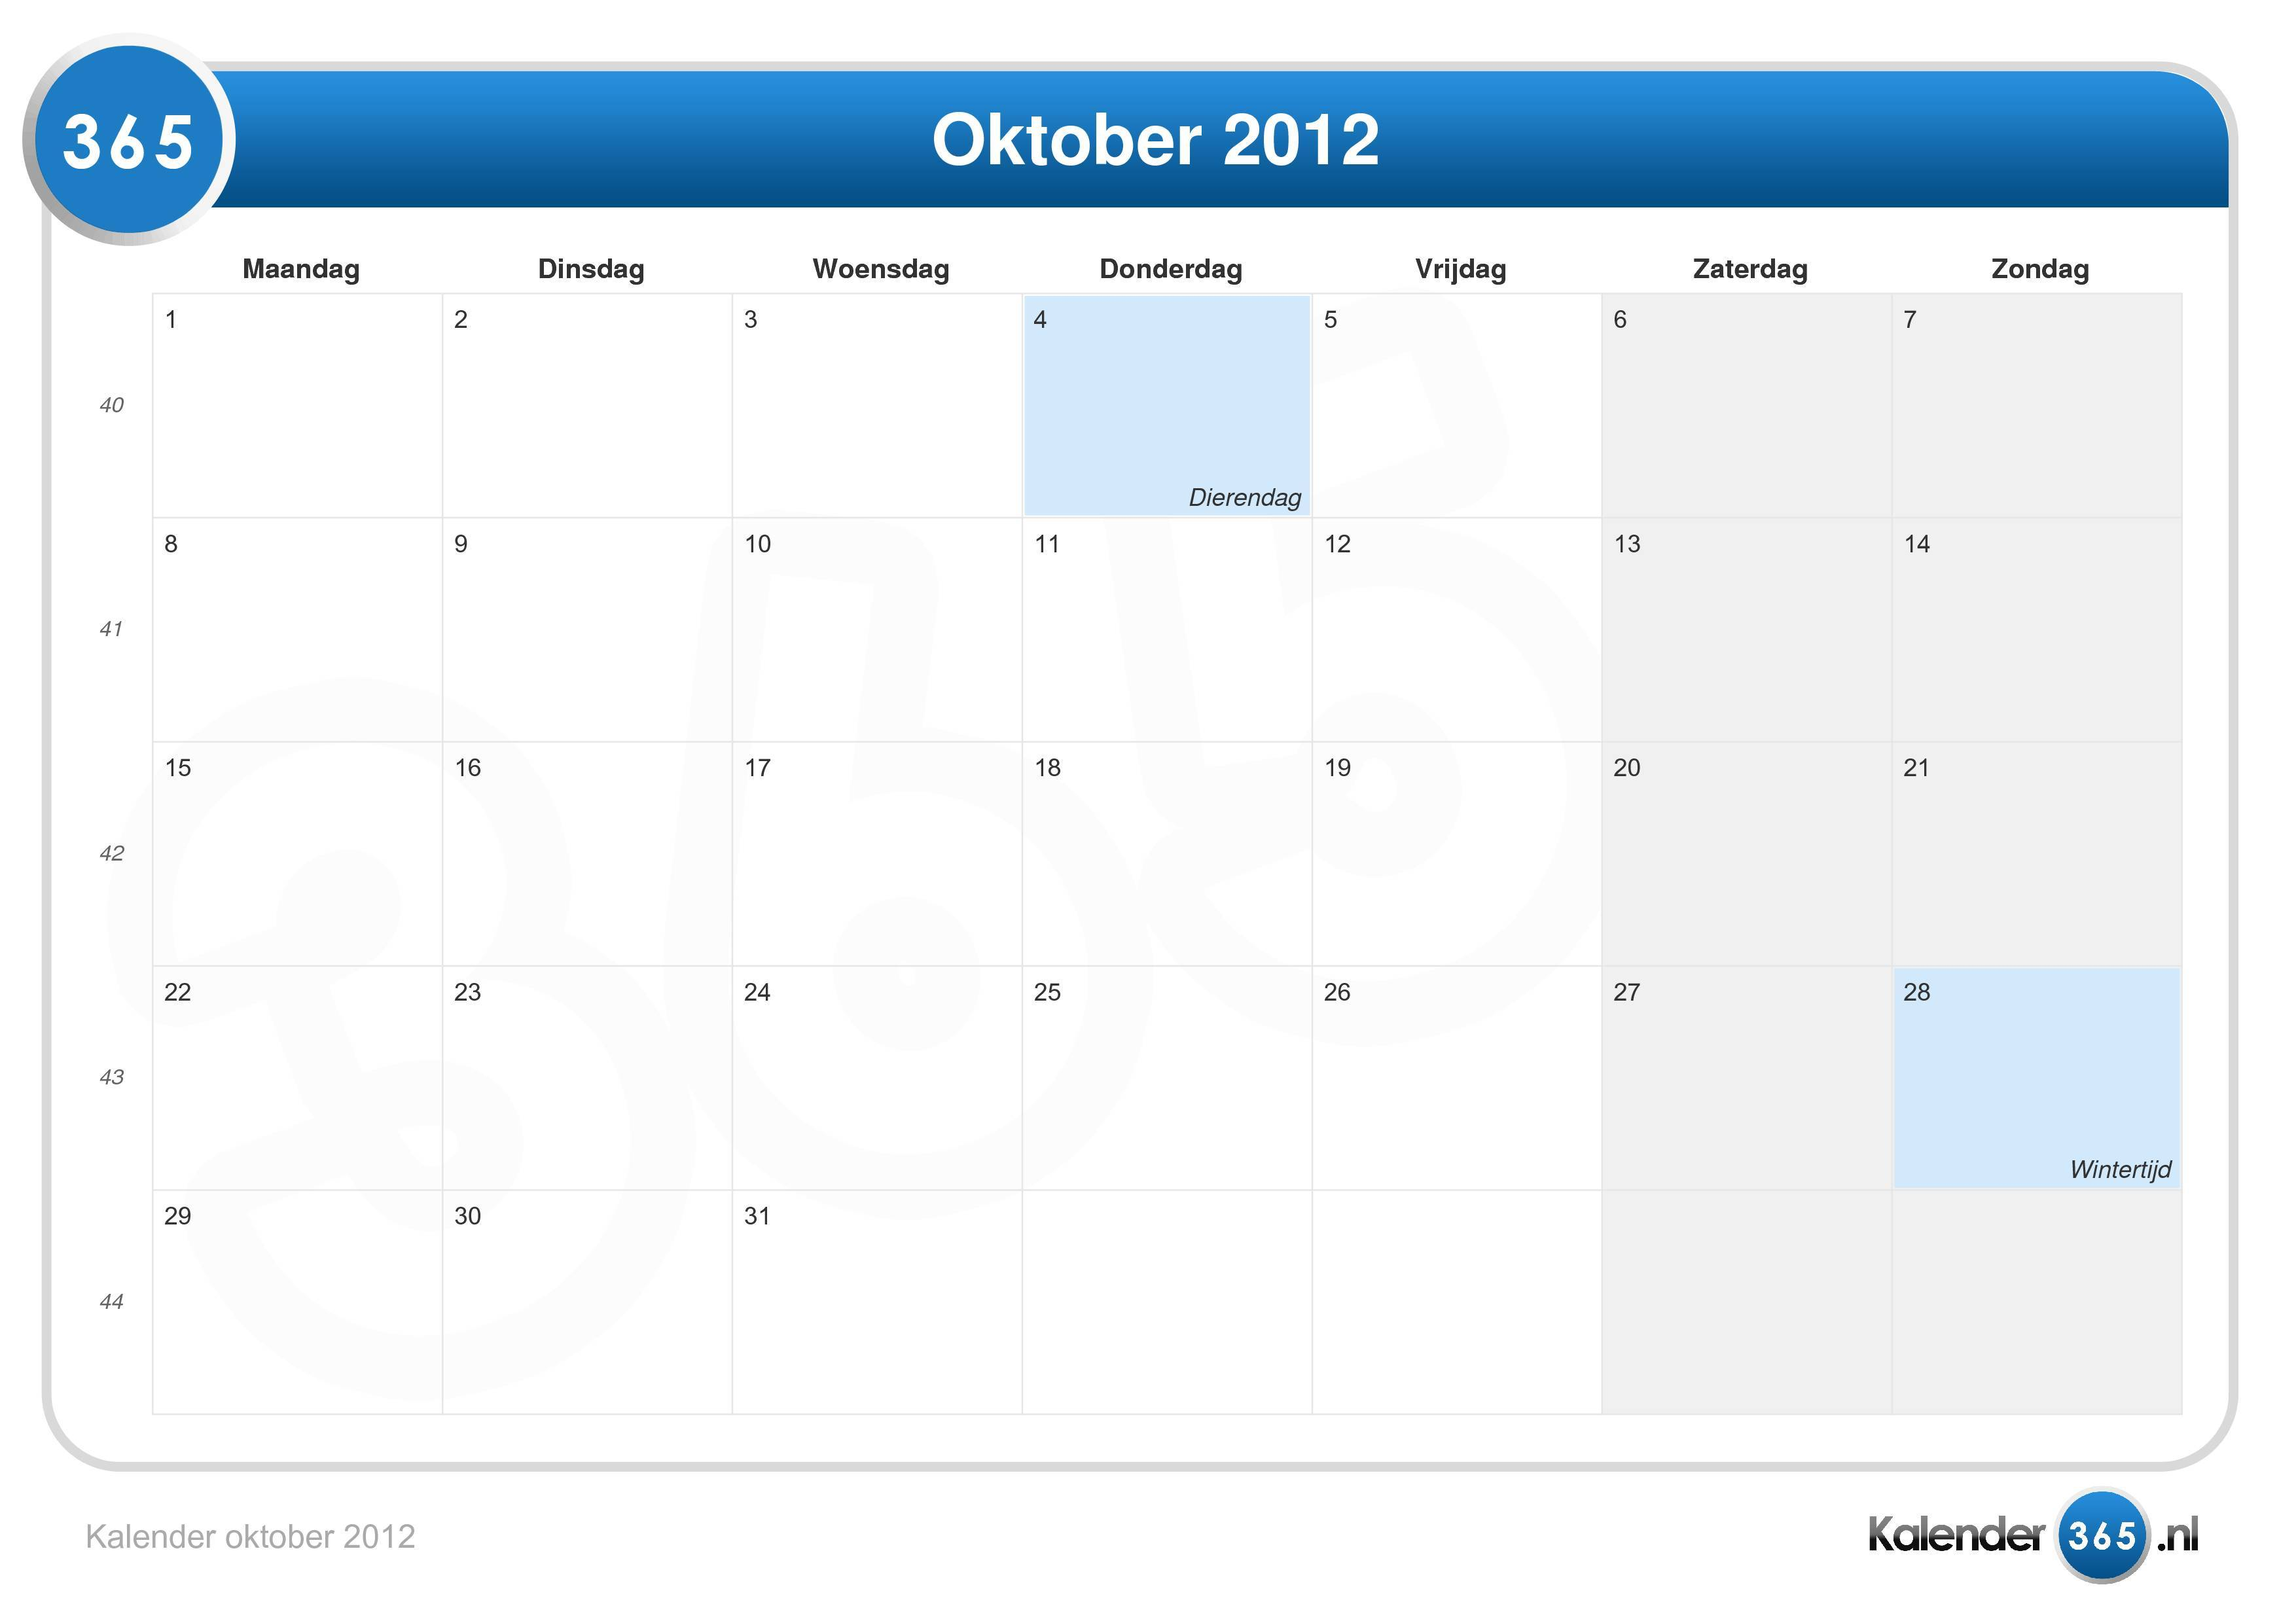 Oktober 2012 kalender